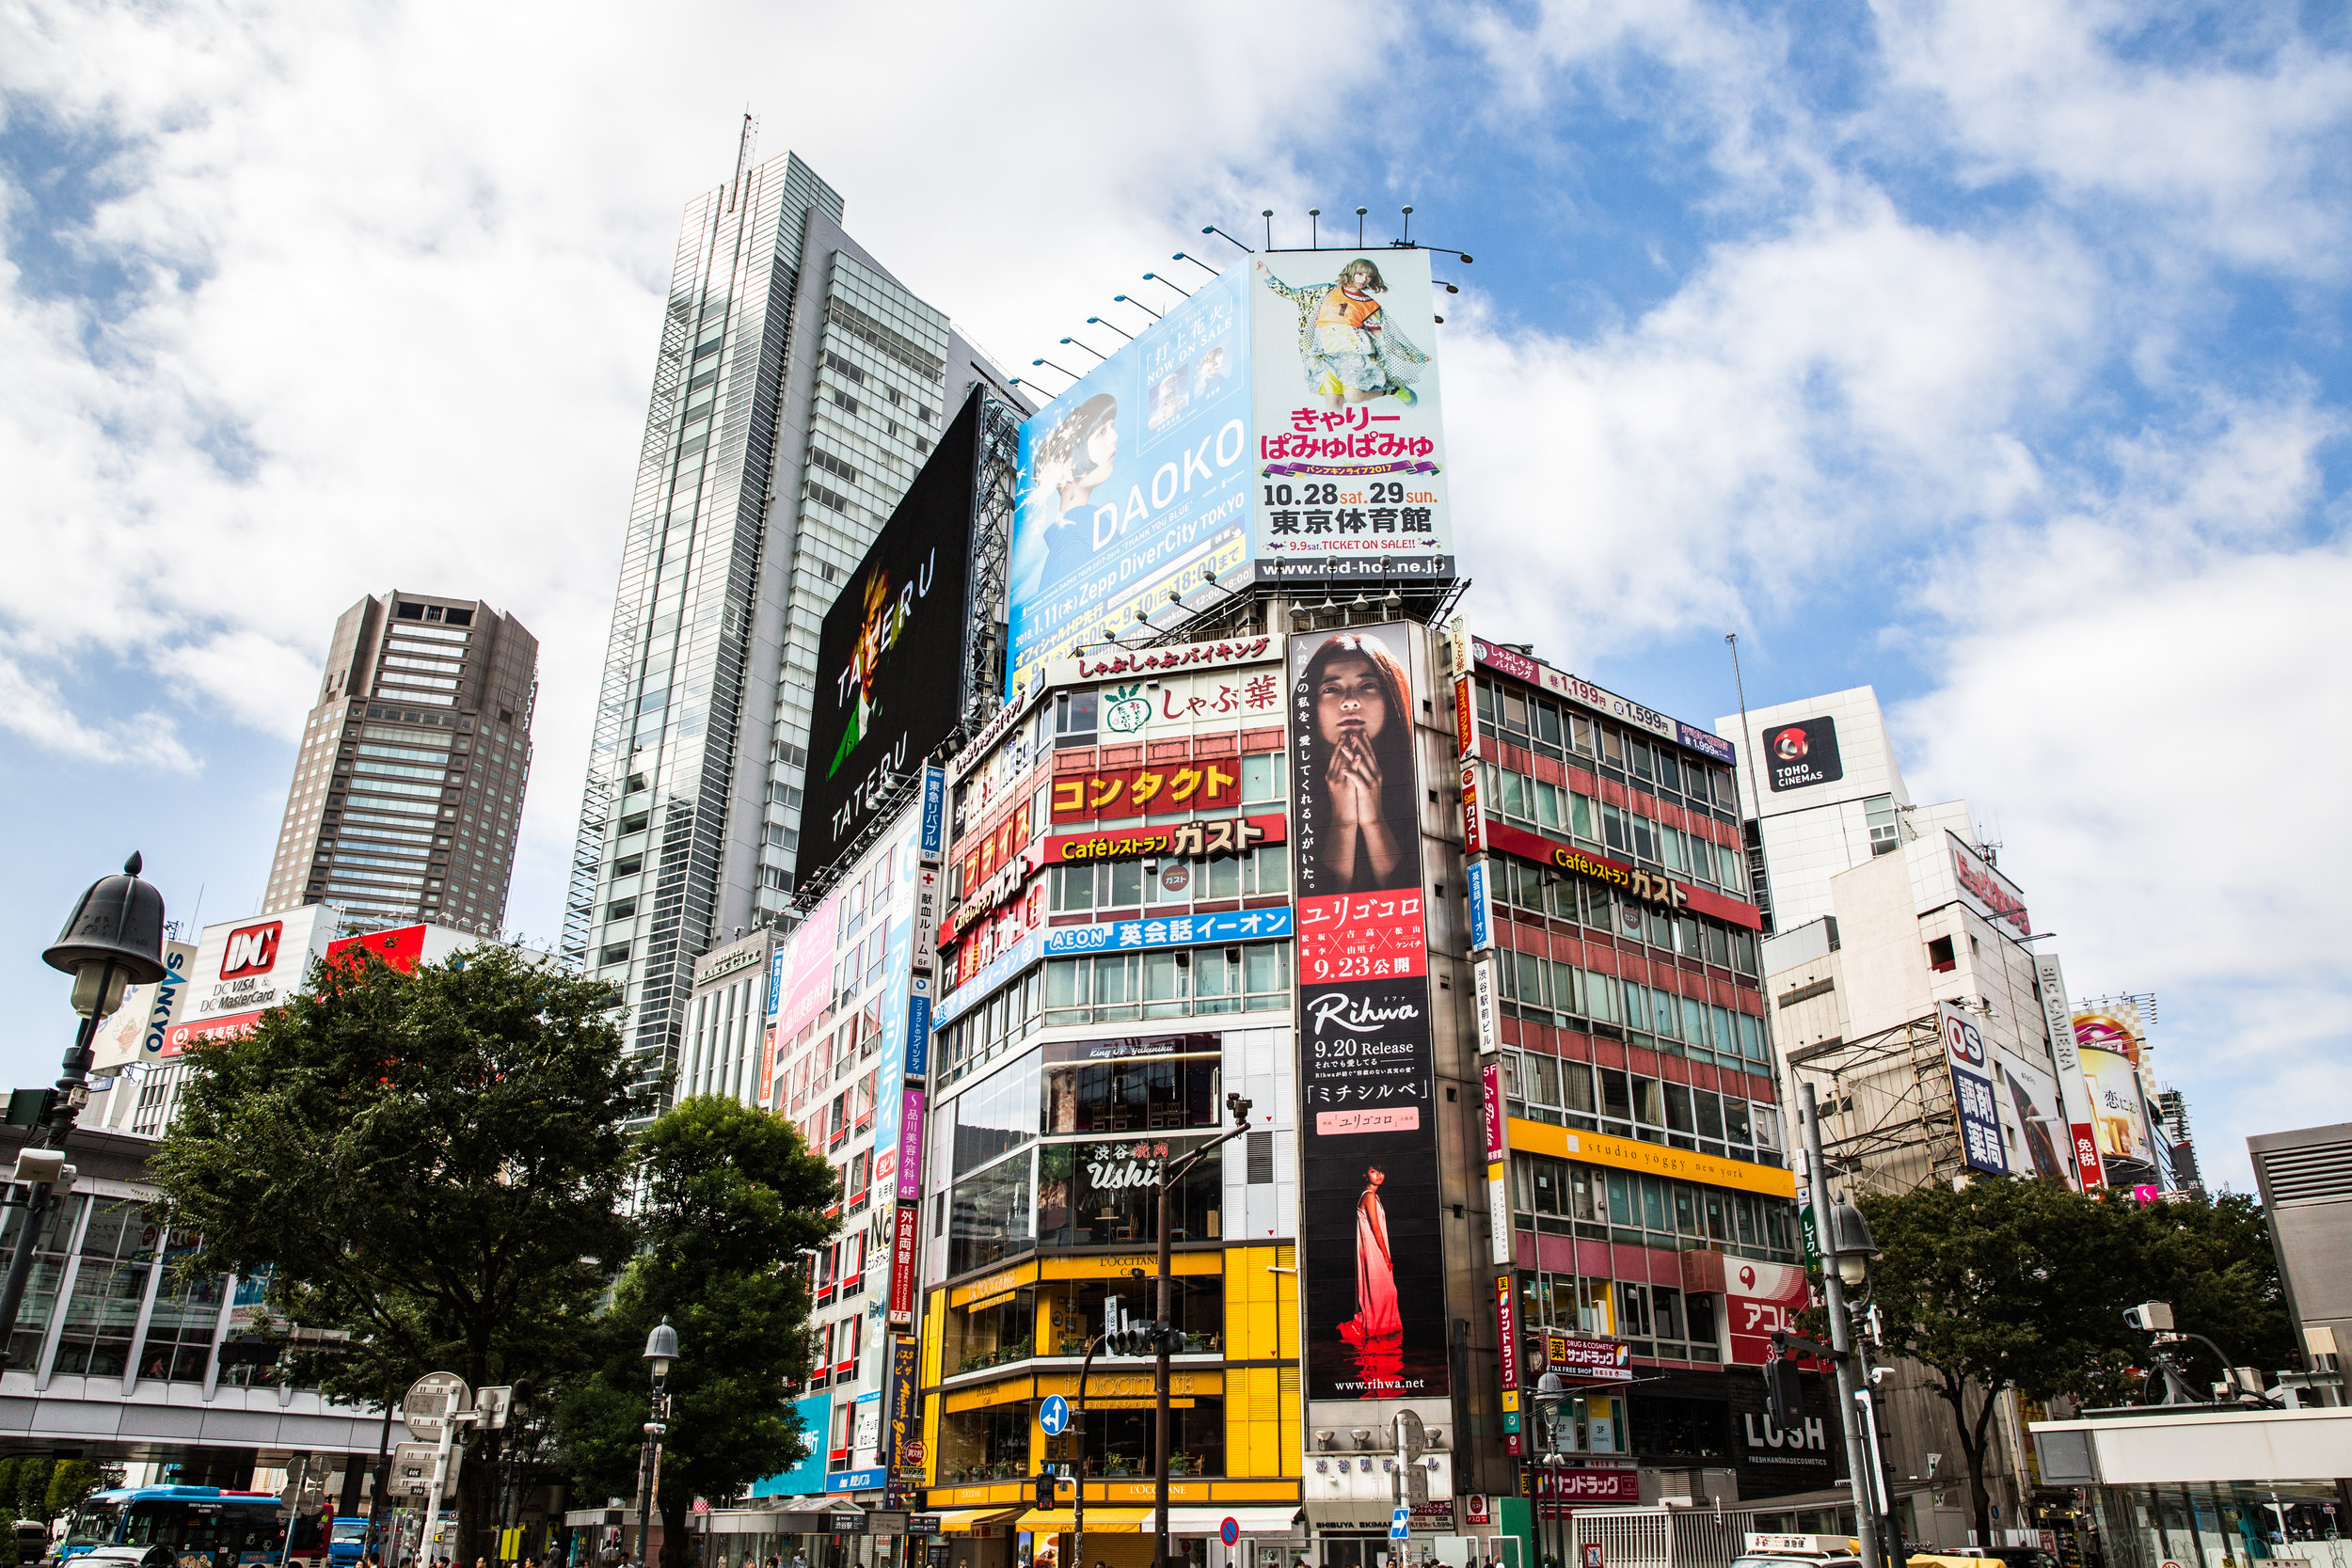 Shibuya Crossing. Stopping wasn't an option.